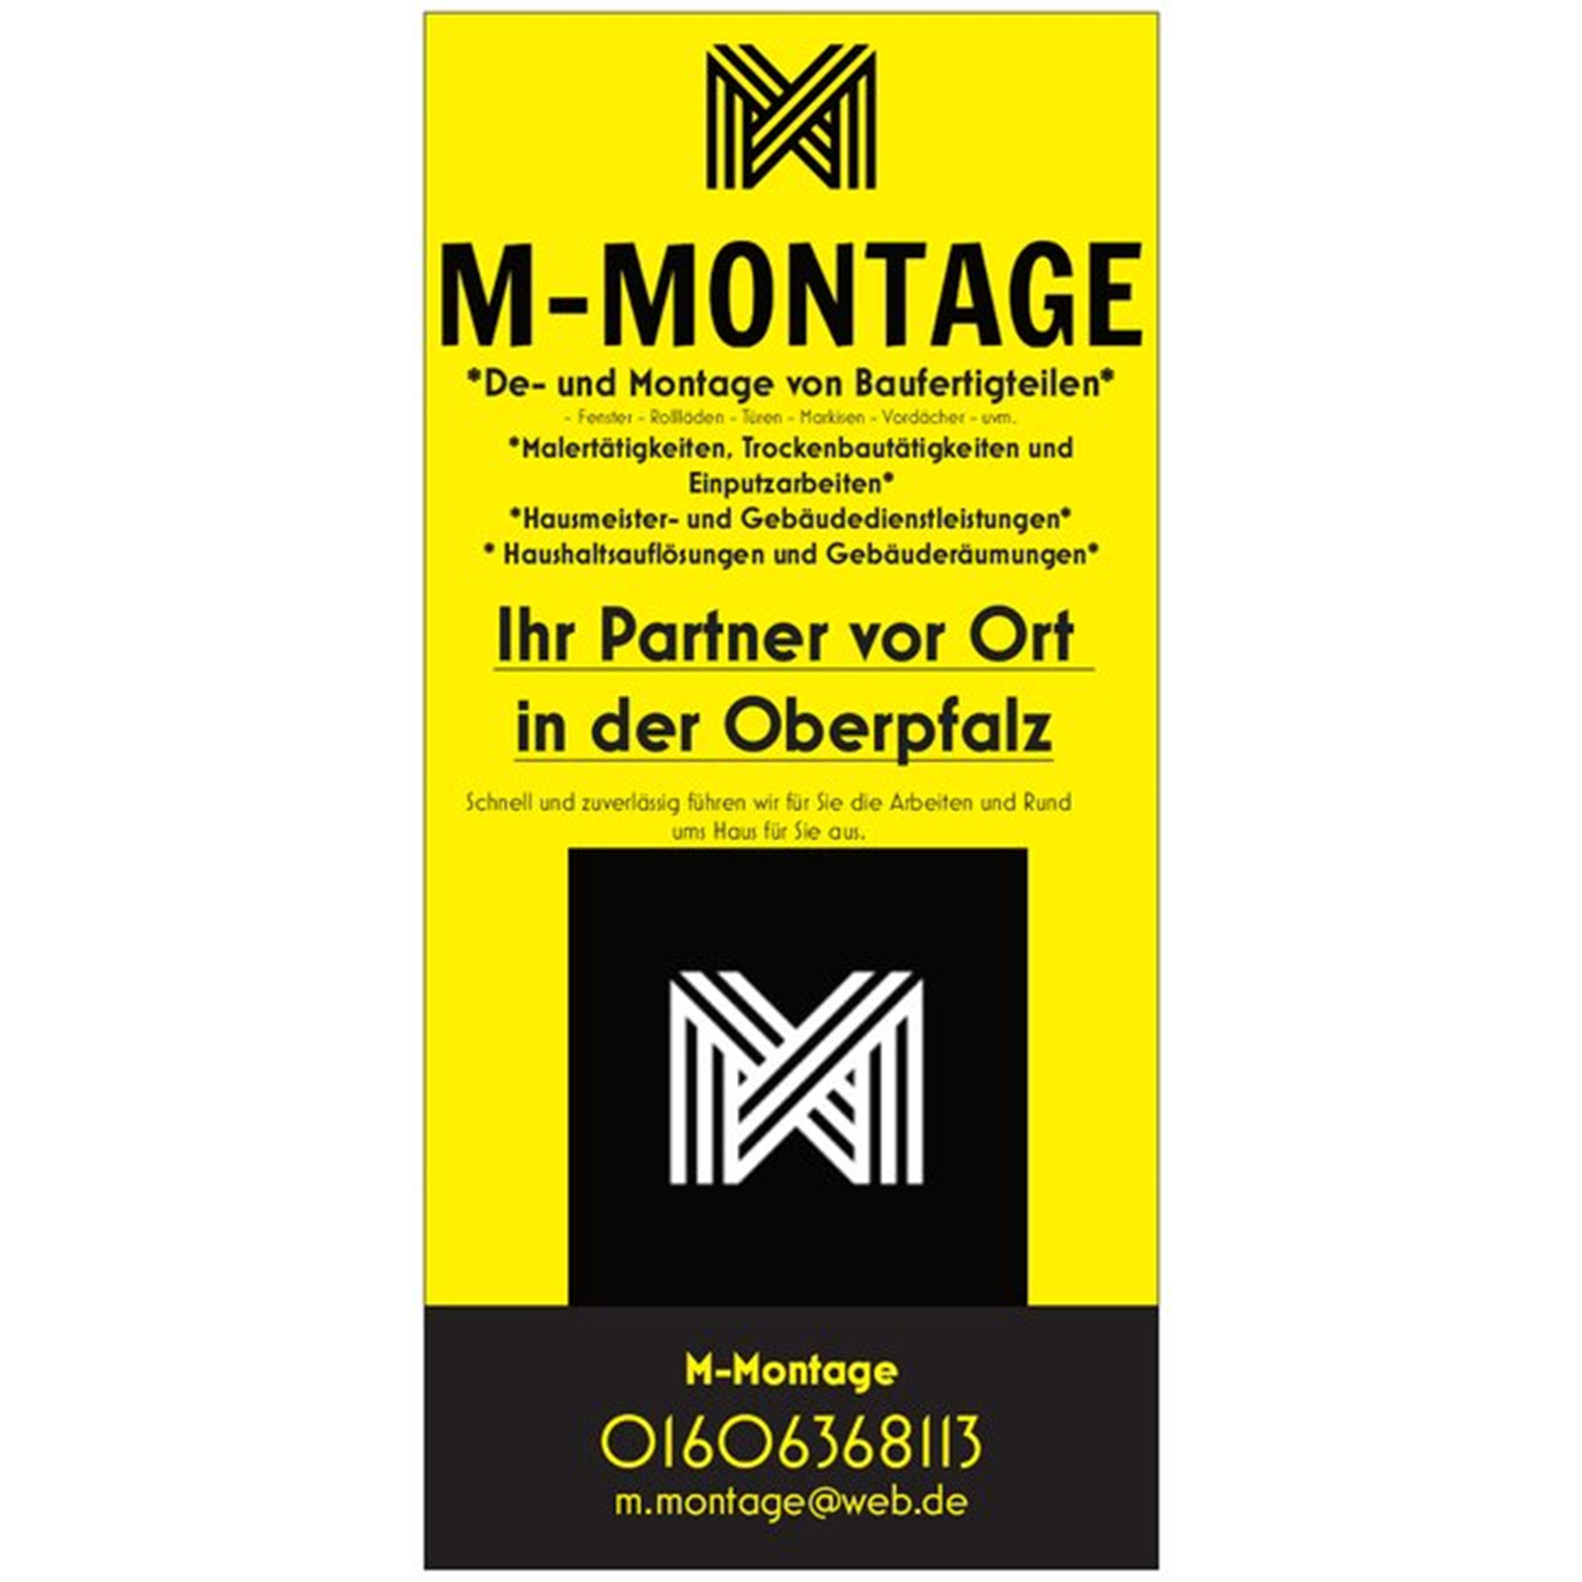 M-Montage